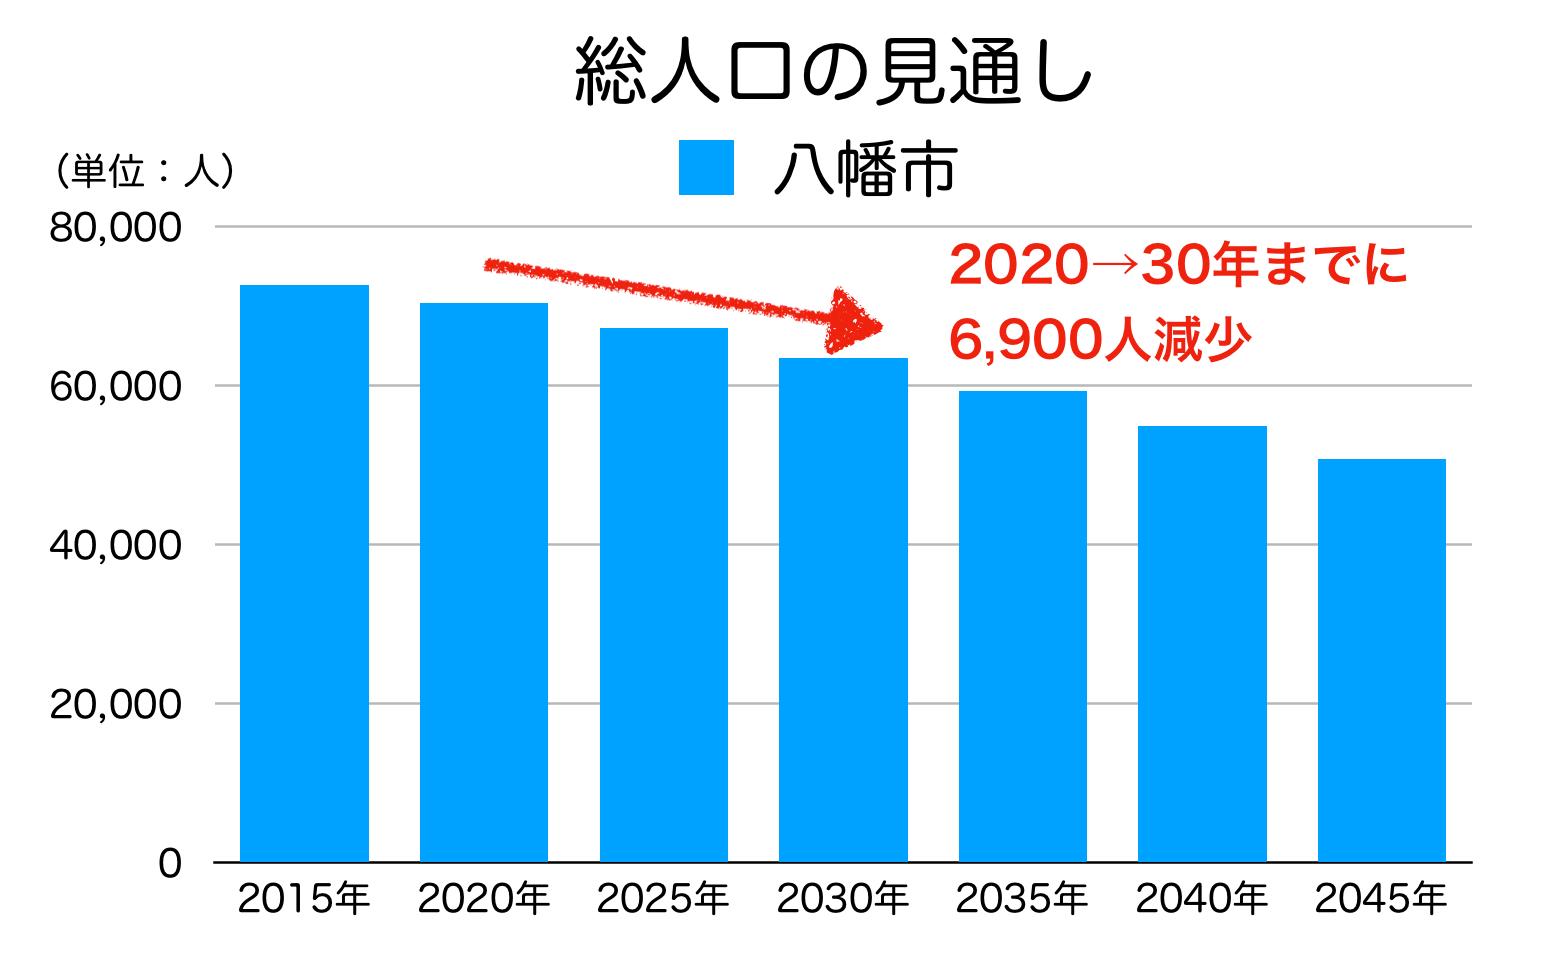 京都府八幡市の人口予測